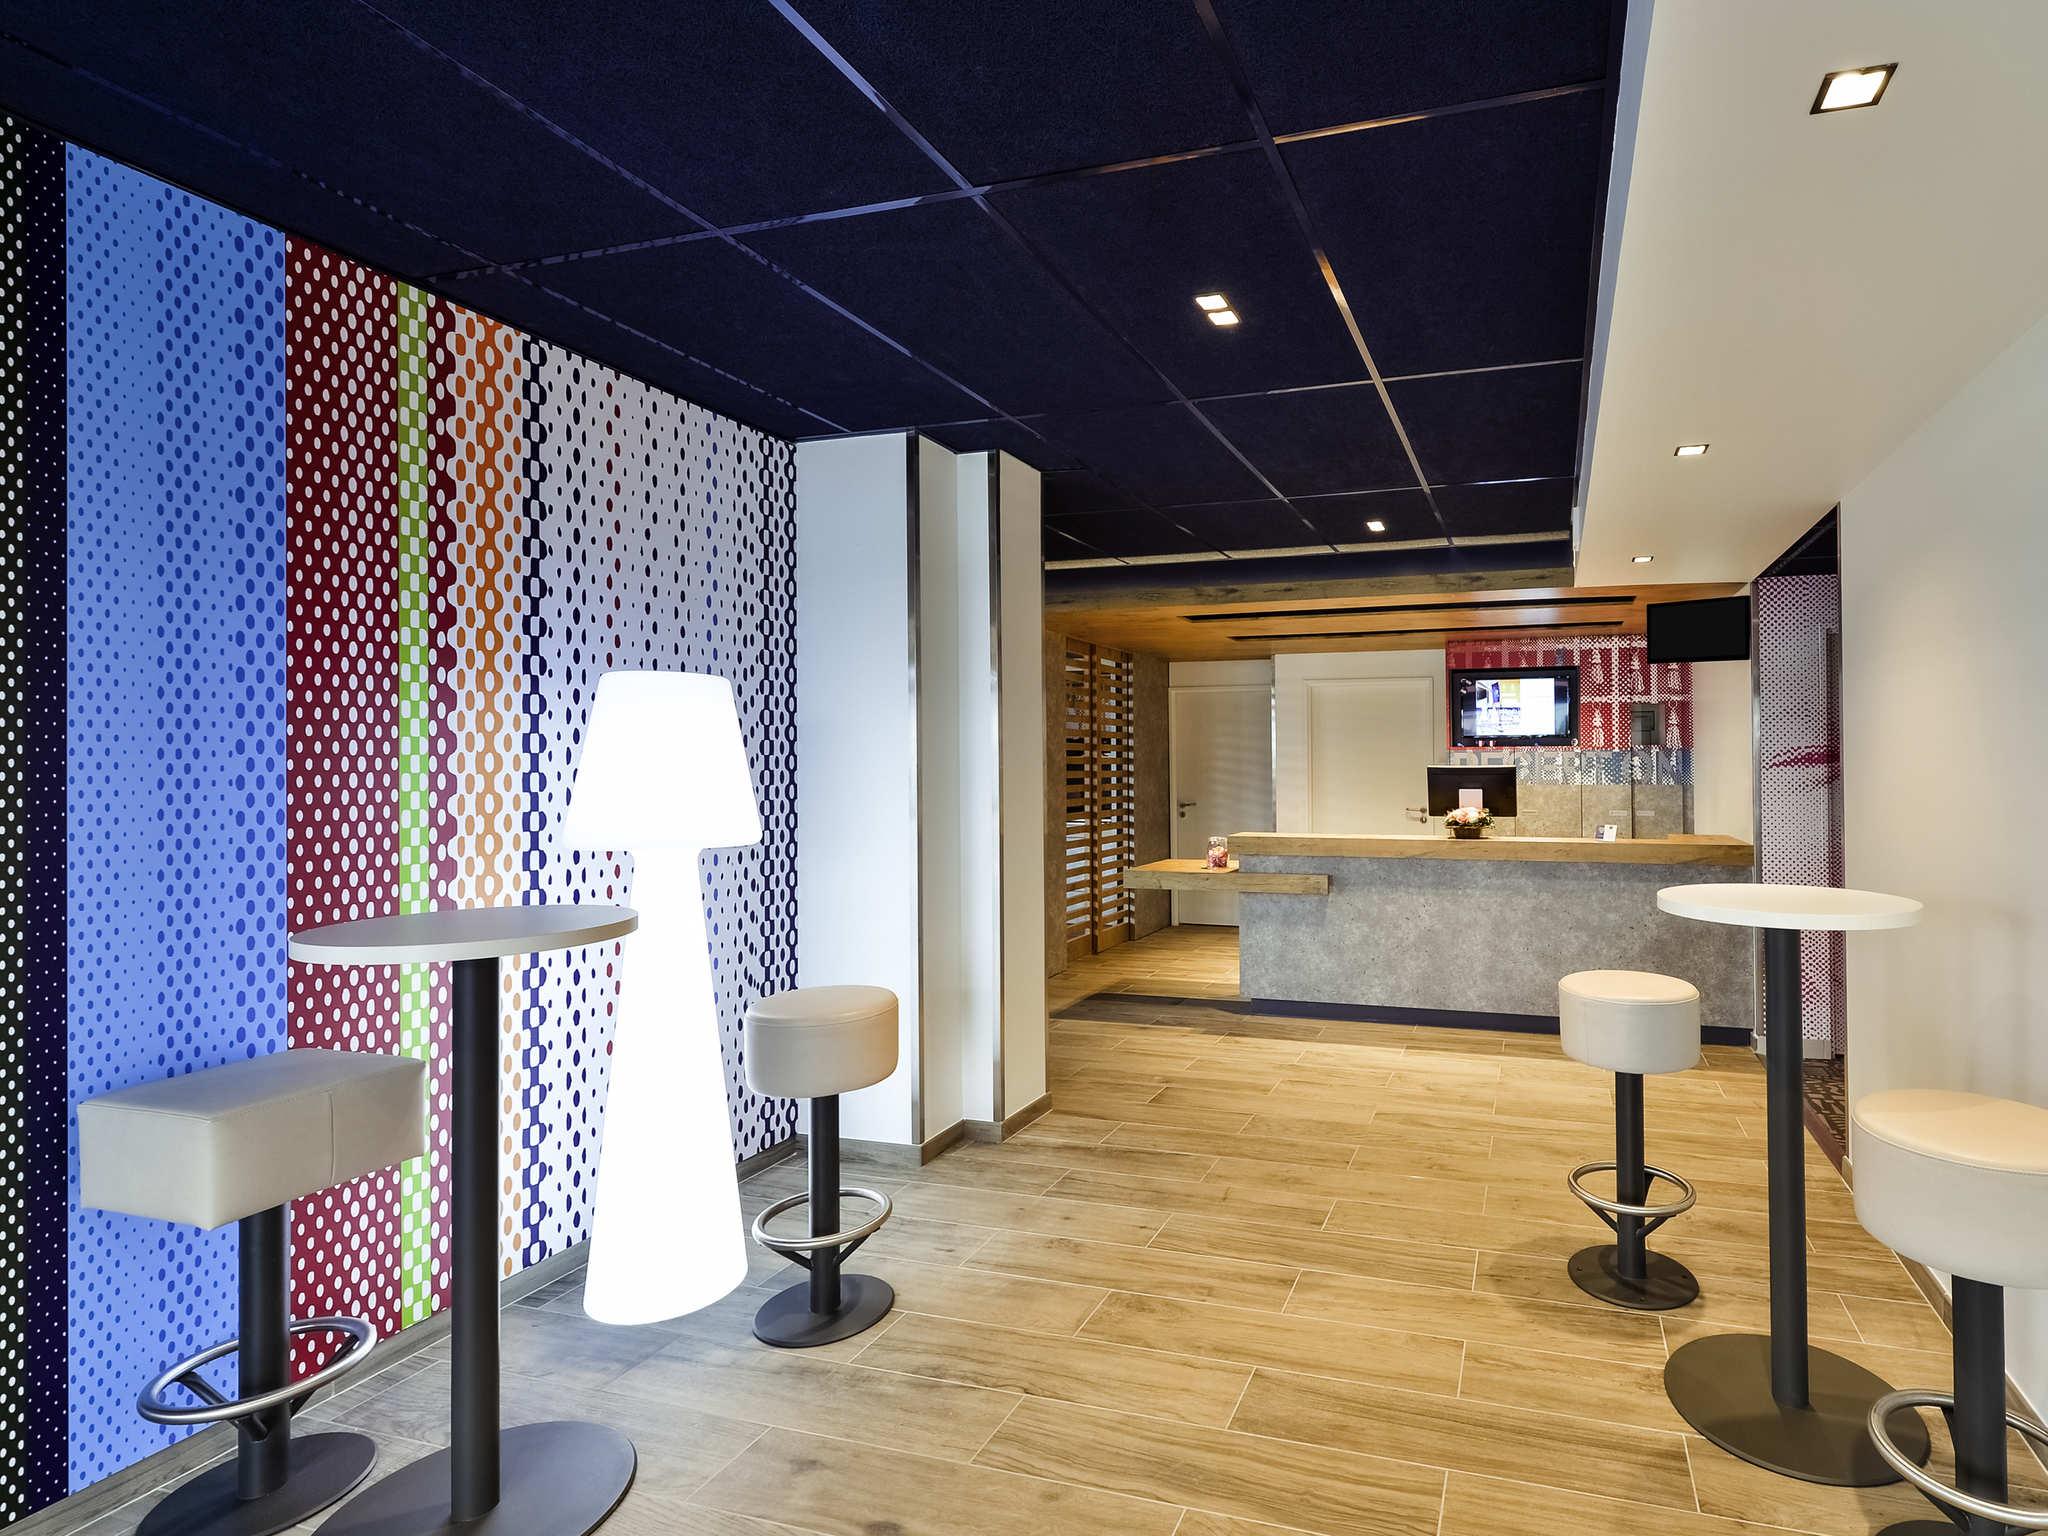 Hotel - ibis budget Macon Creches (Eröffnung: Mai 2018)